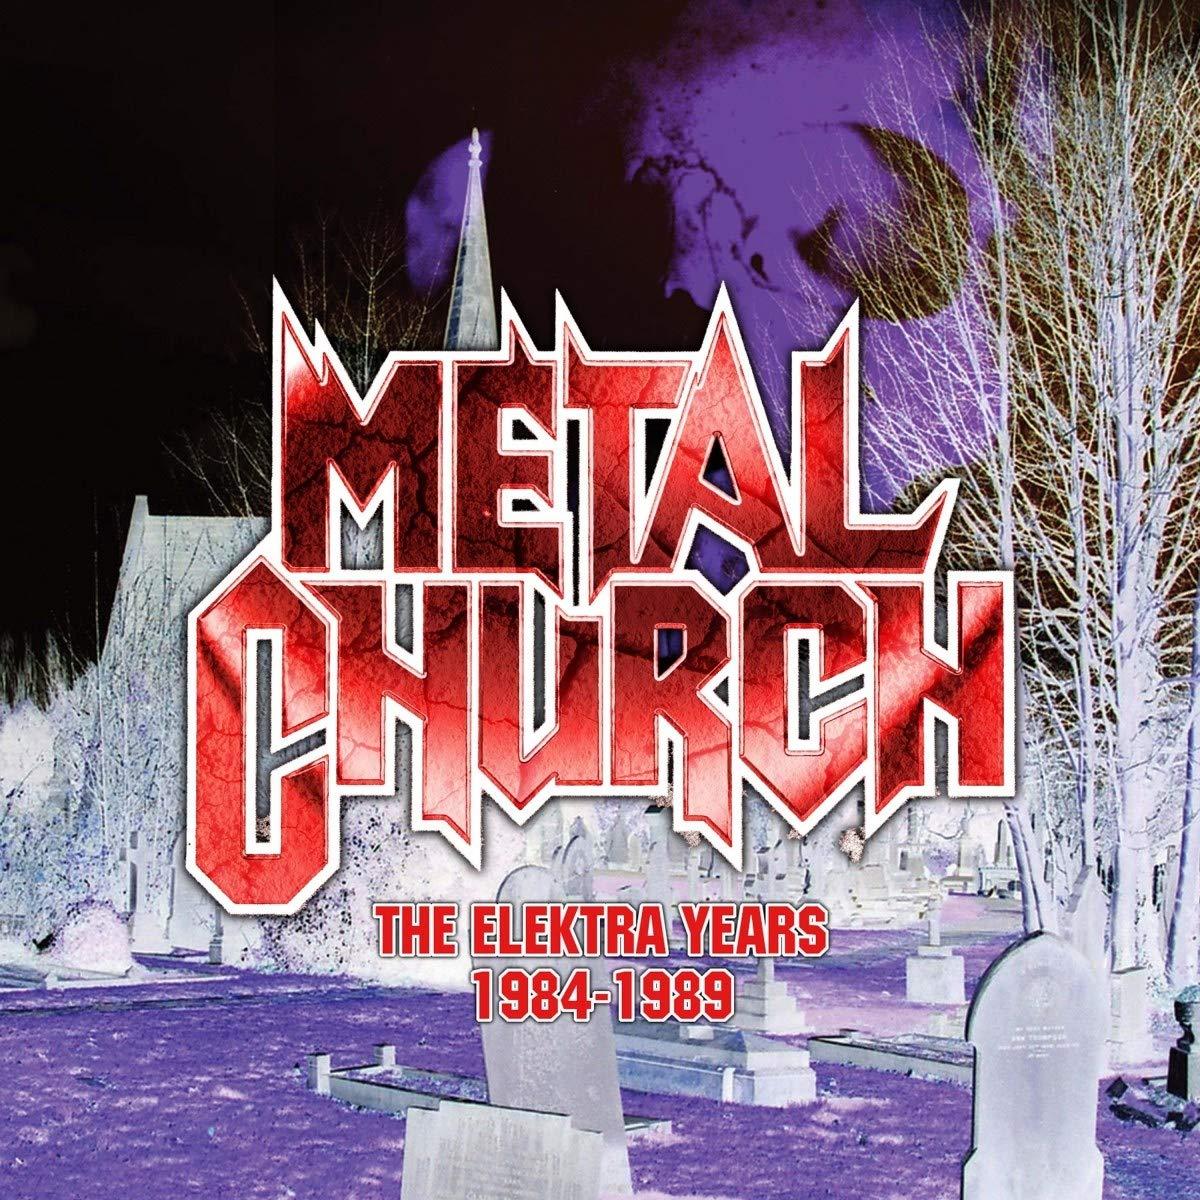 Metal Church – The Elektra Years 1984-1989 (2020) [FLAC]